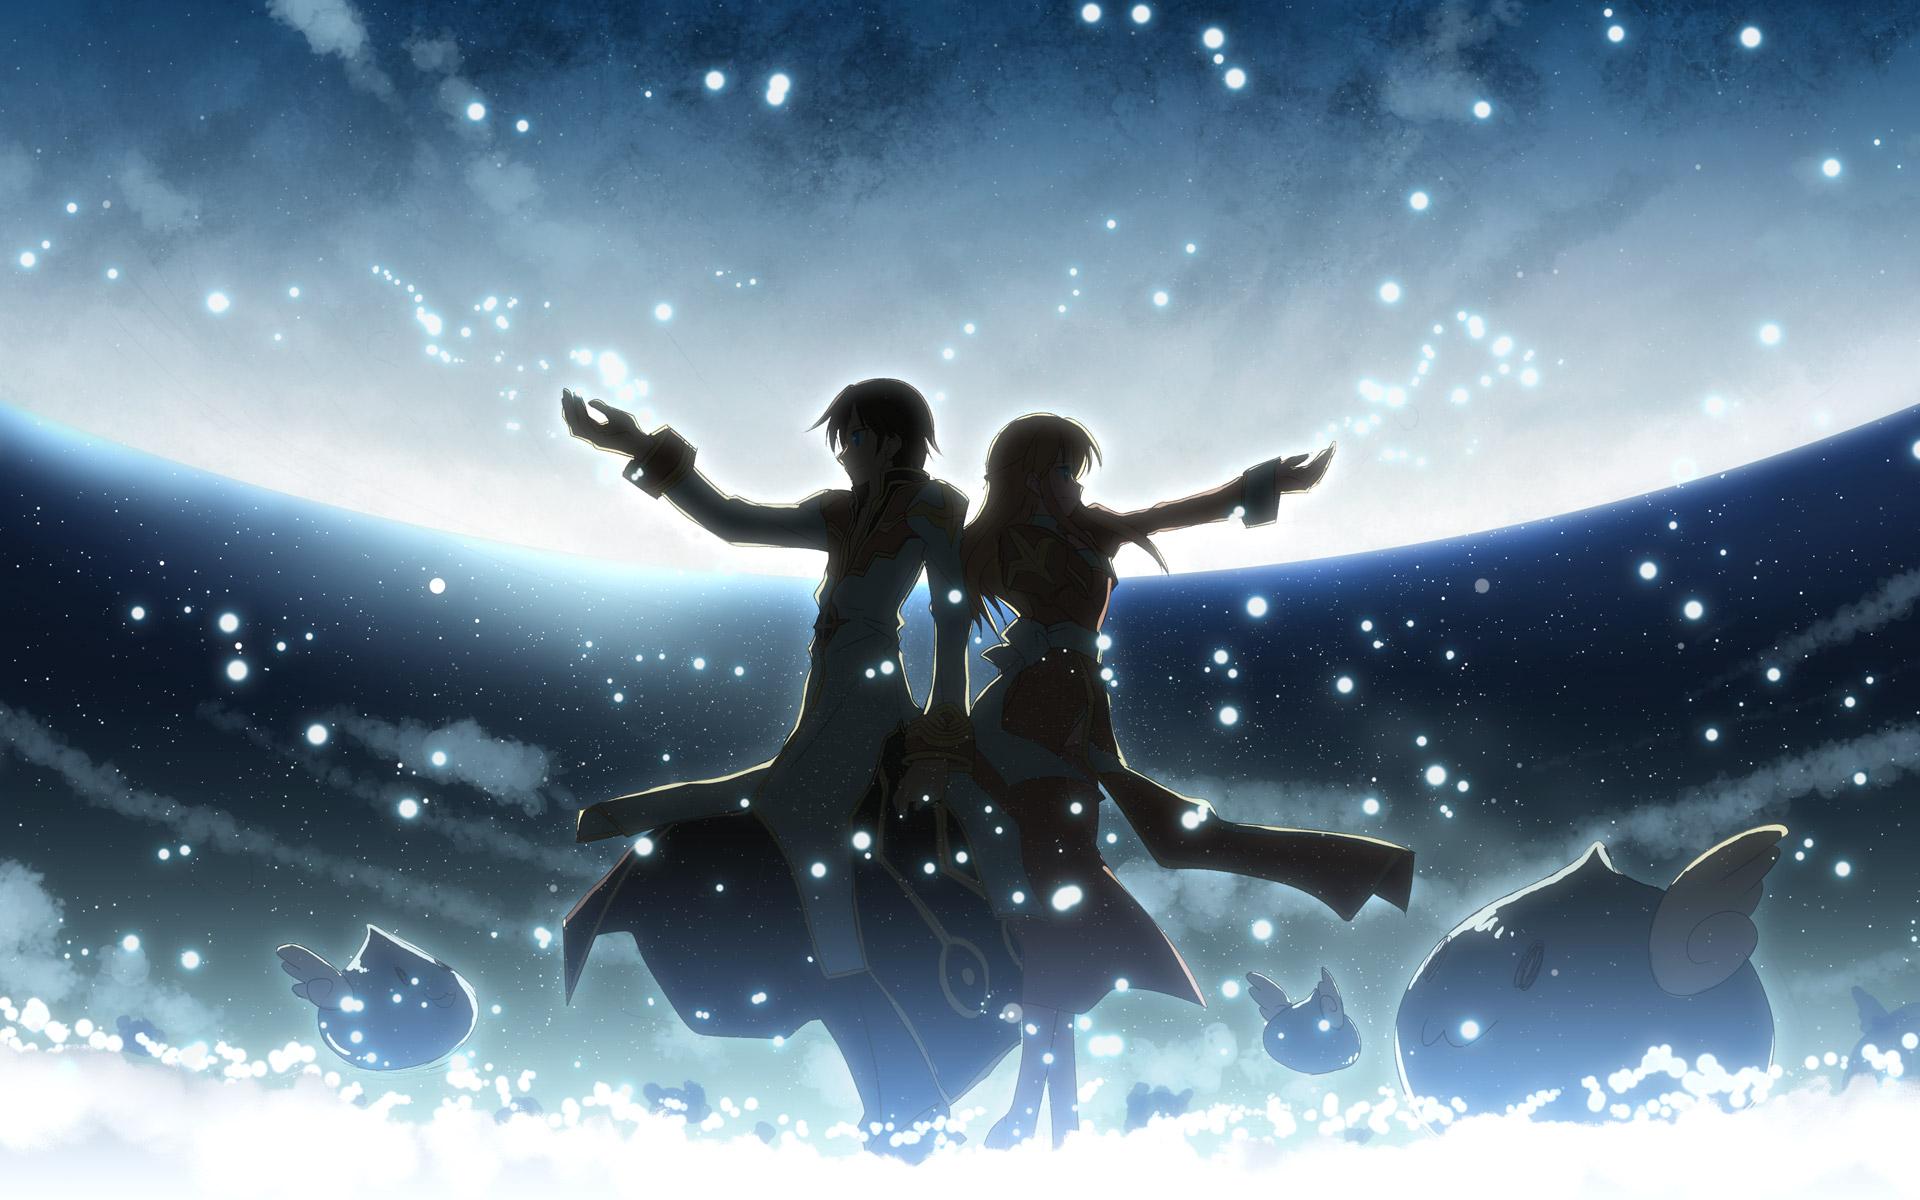 RAGNARÖK ONLINE Image #827802 - Zerochan Anime Image Board